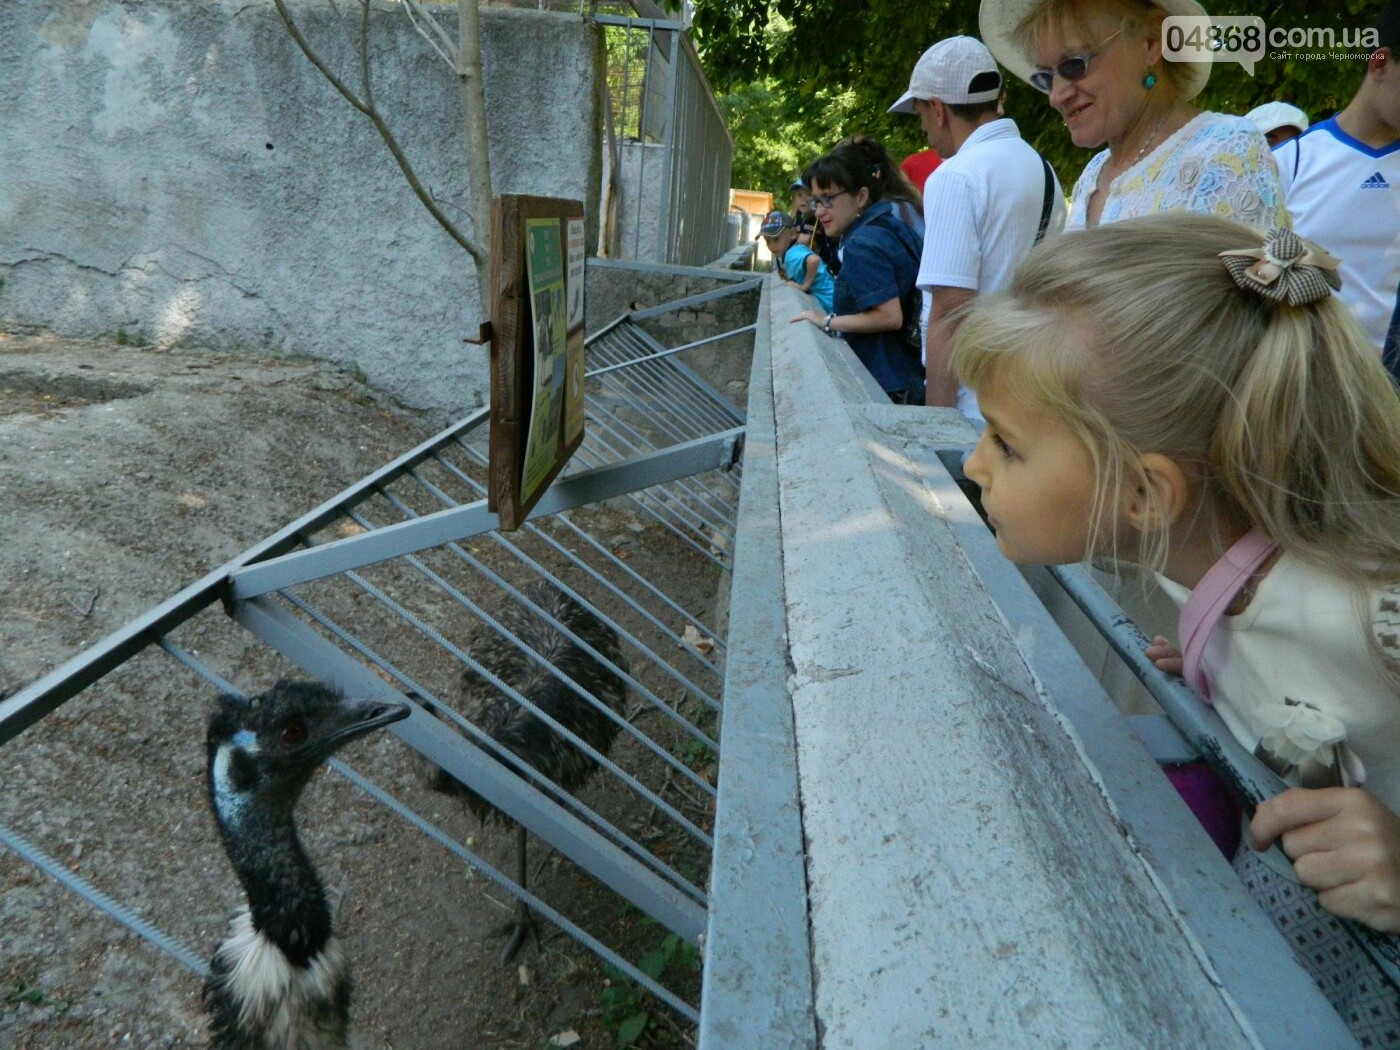 Дети из реабилитационного центра «Радуга» посетили зоопарк, фото-2